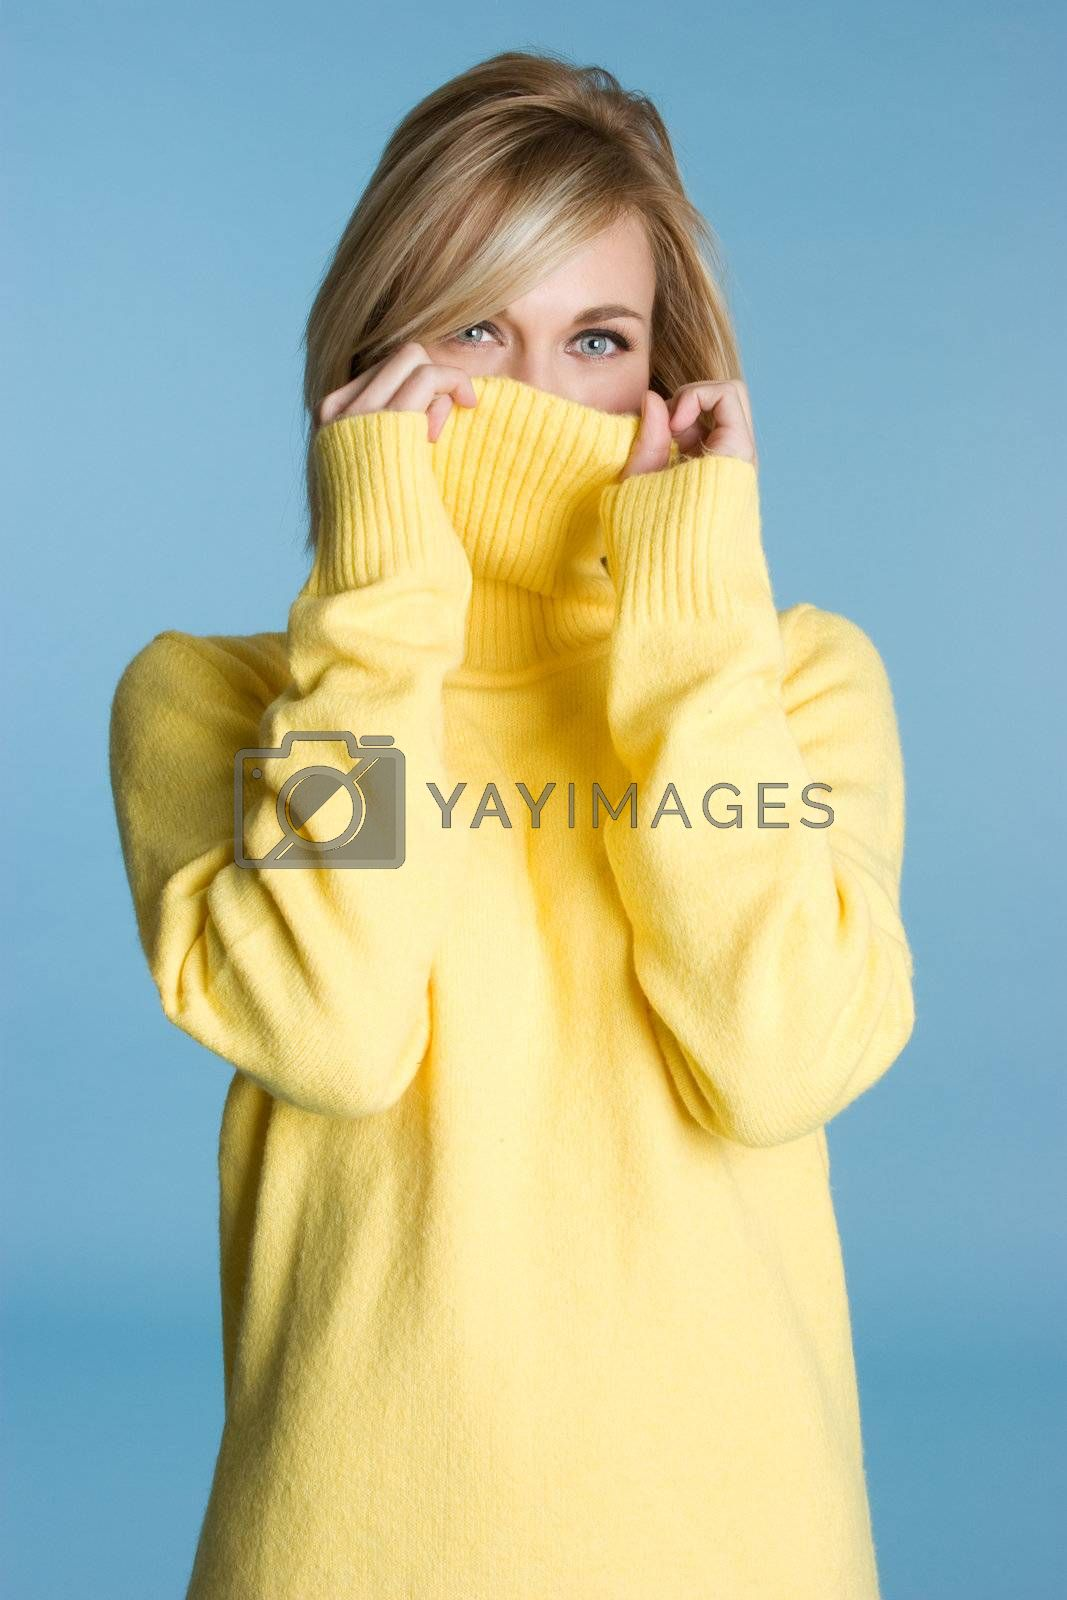 Pretty girl wearing yellow sweater